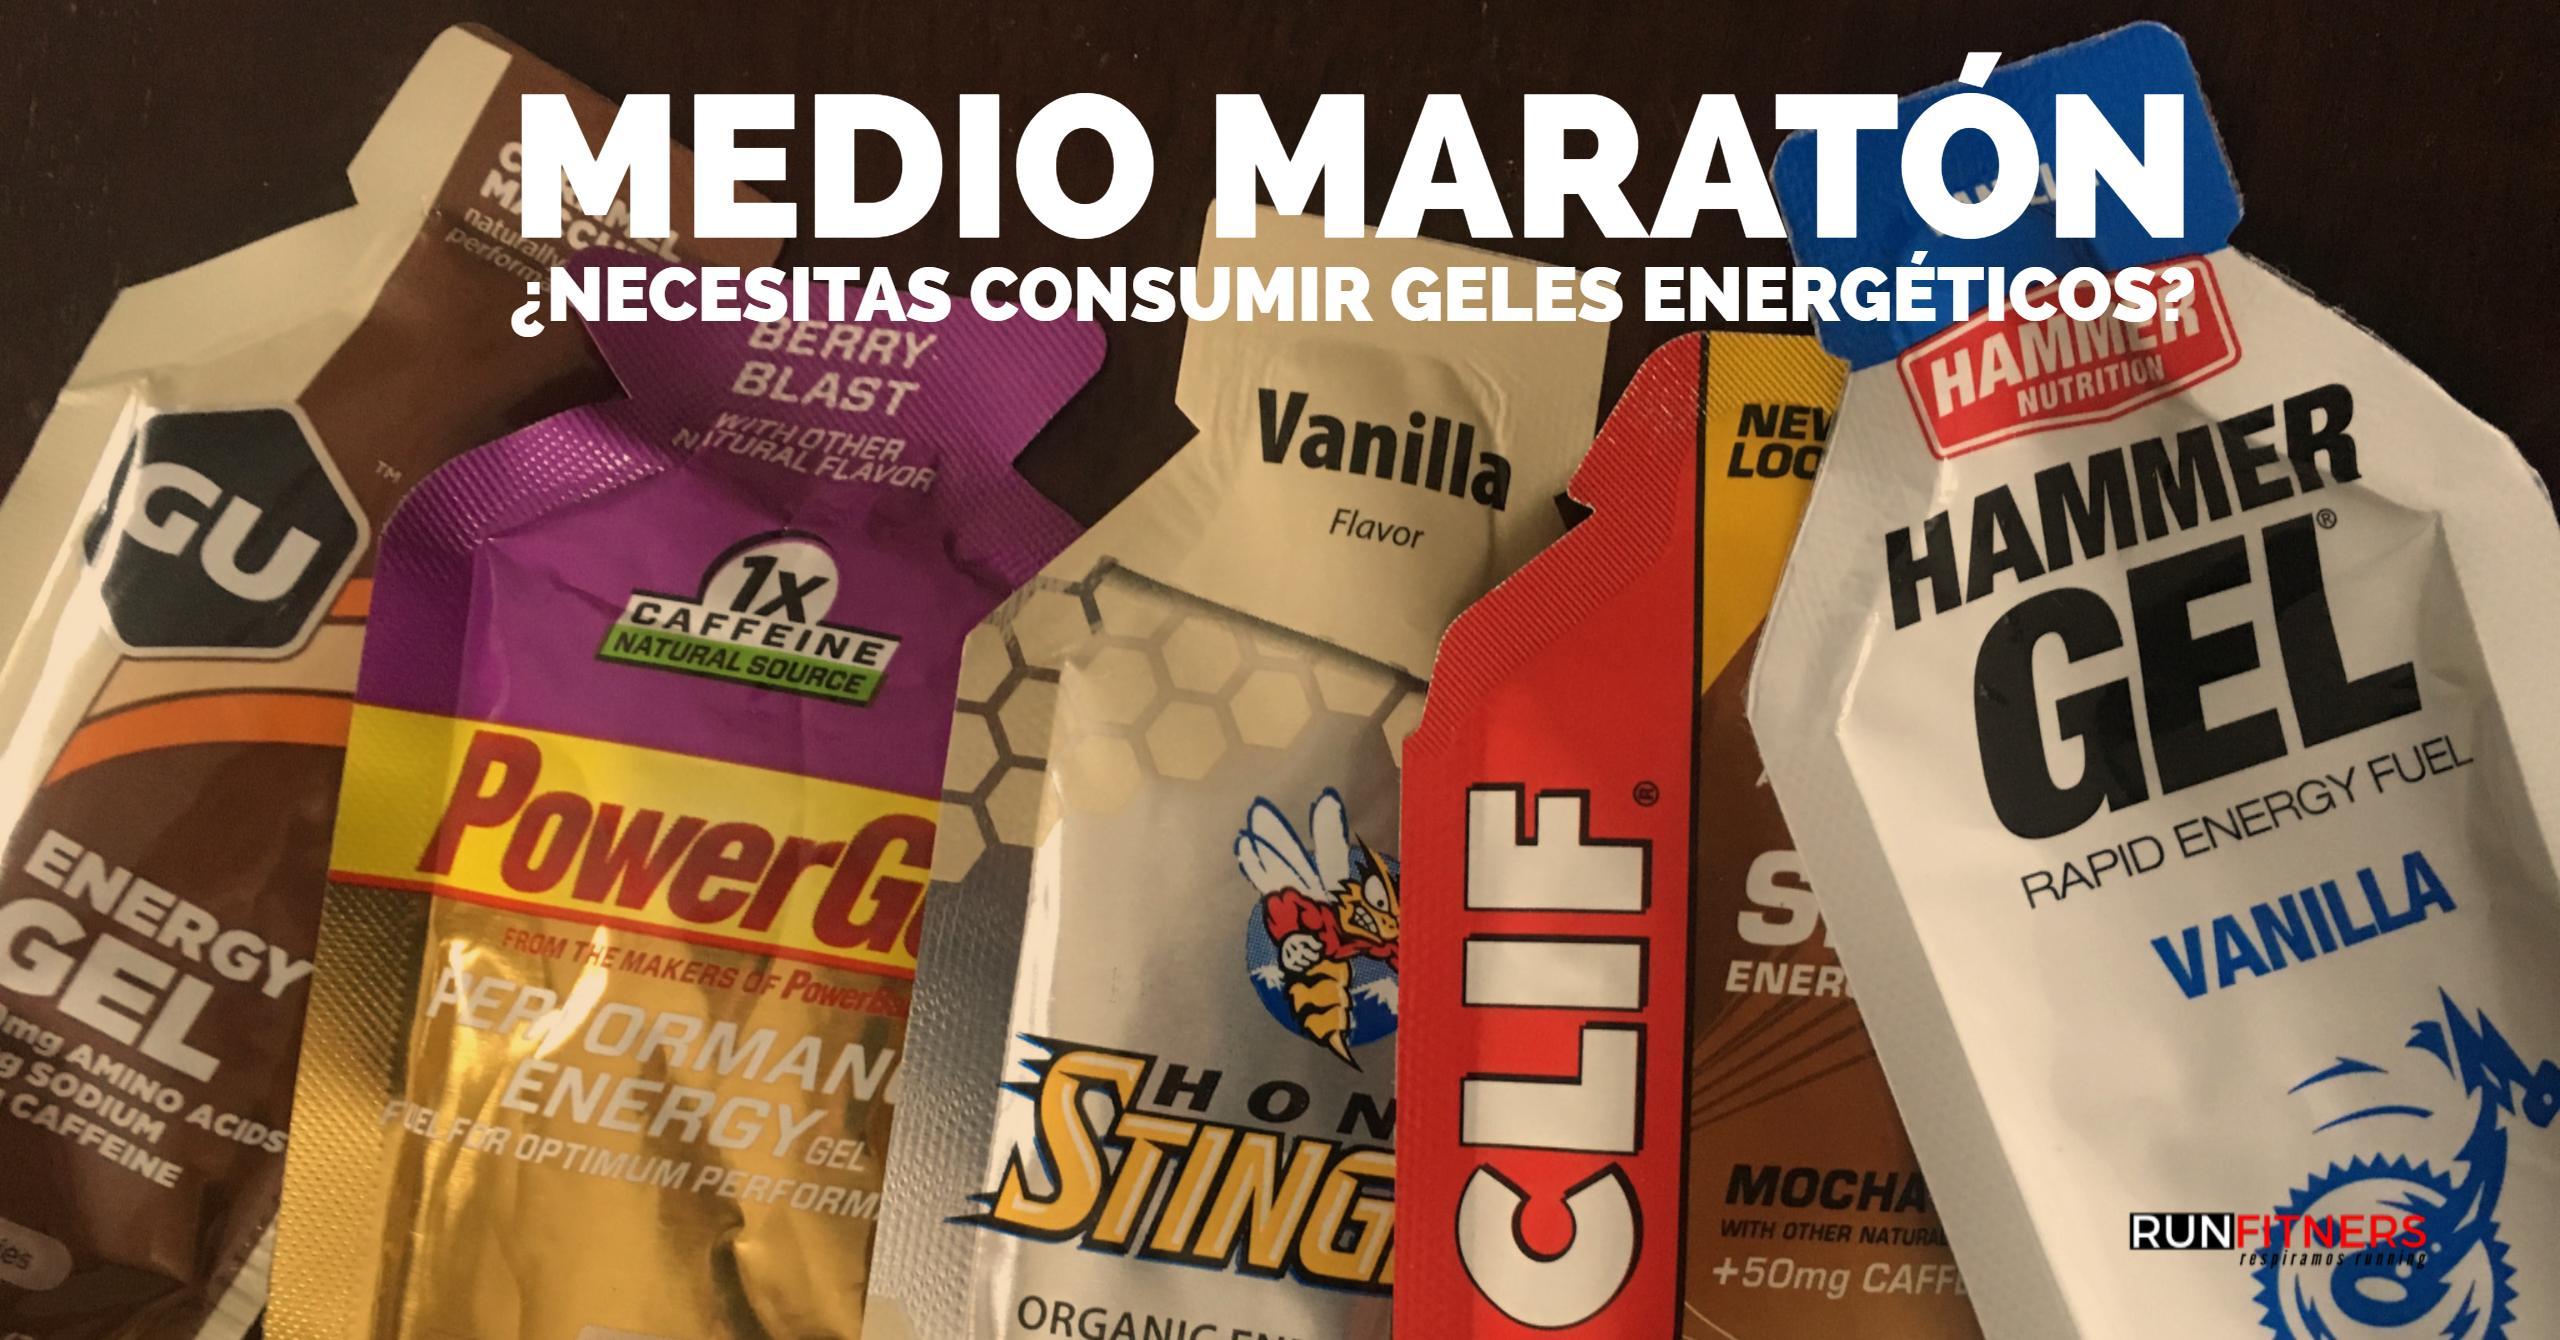 geles medio maratón